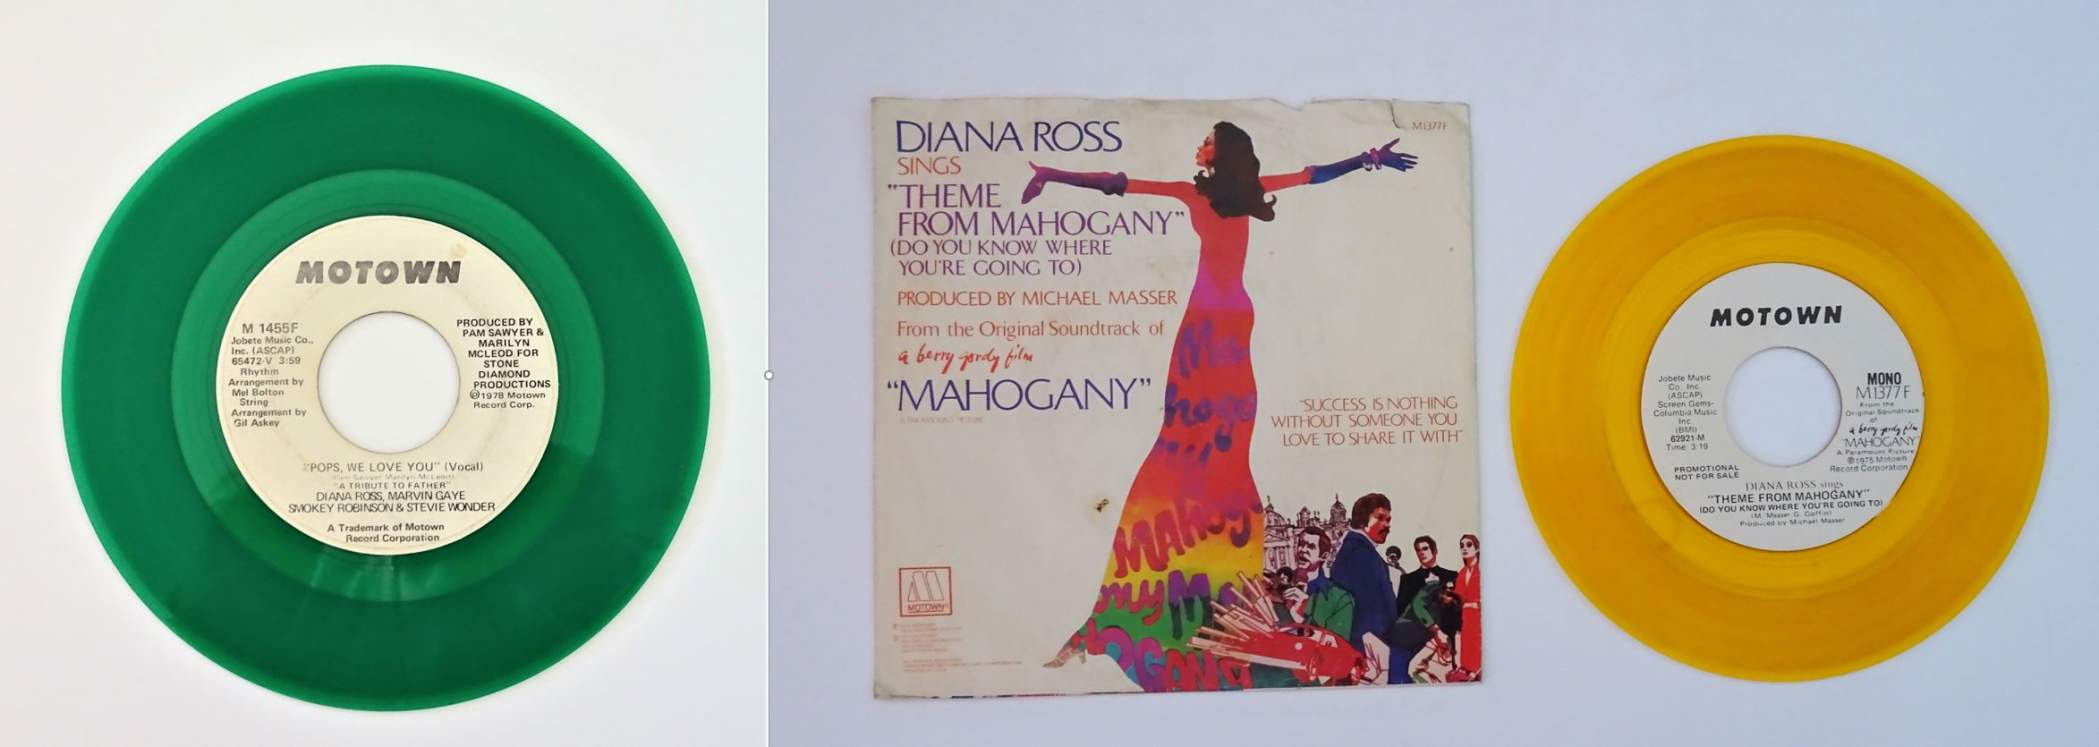 Name:  vinyl.jpg Views: 818 Size:  94.6 KB